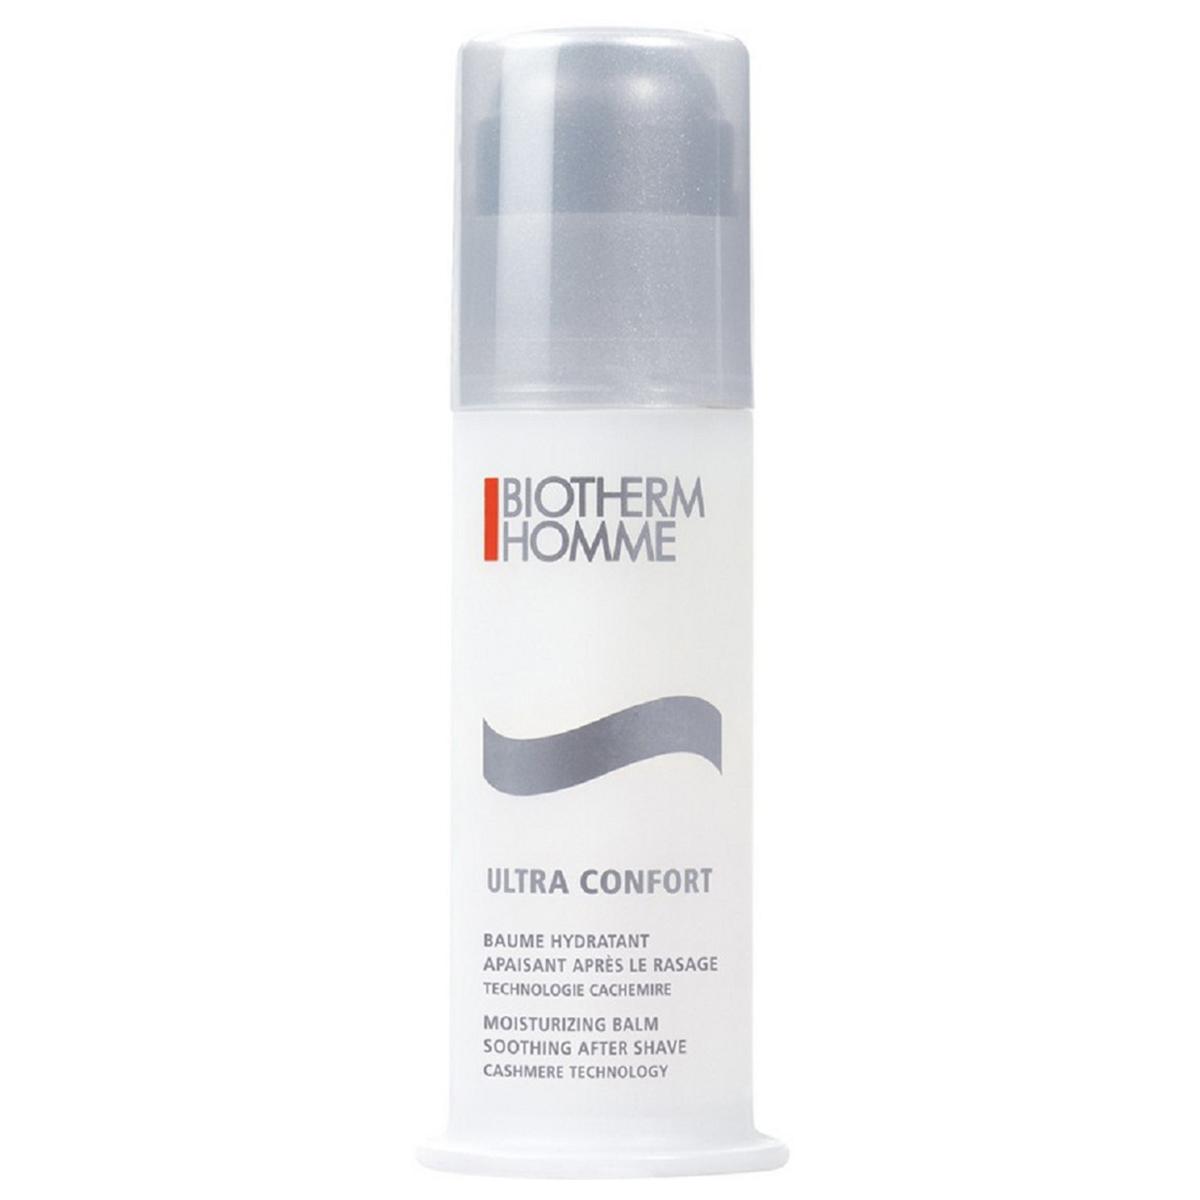 Biotherm Homme - Ultra Confort - Baume Hydratant Apaisant après-rasage 75 ml